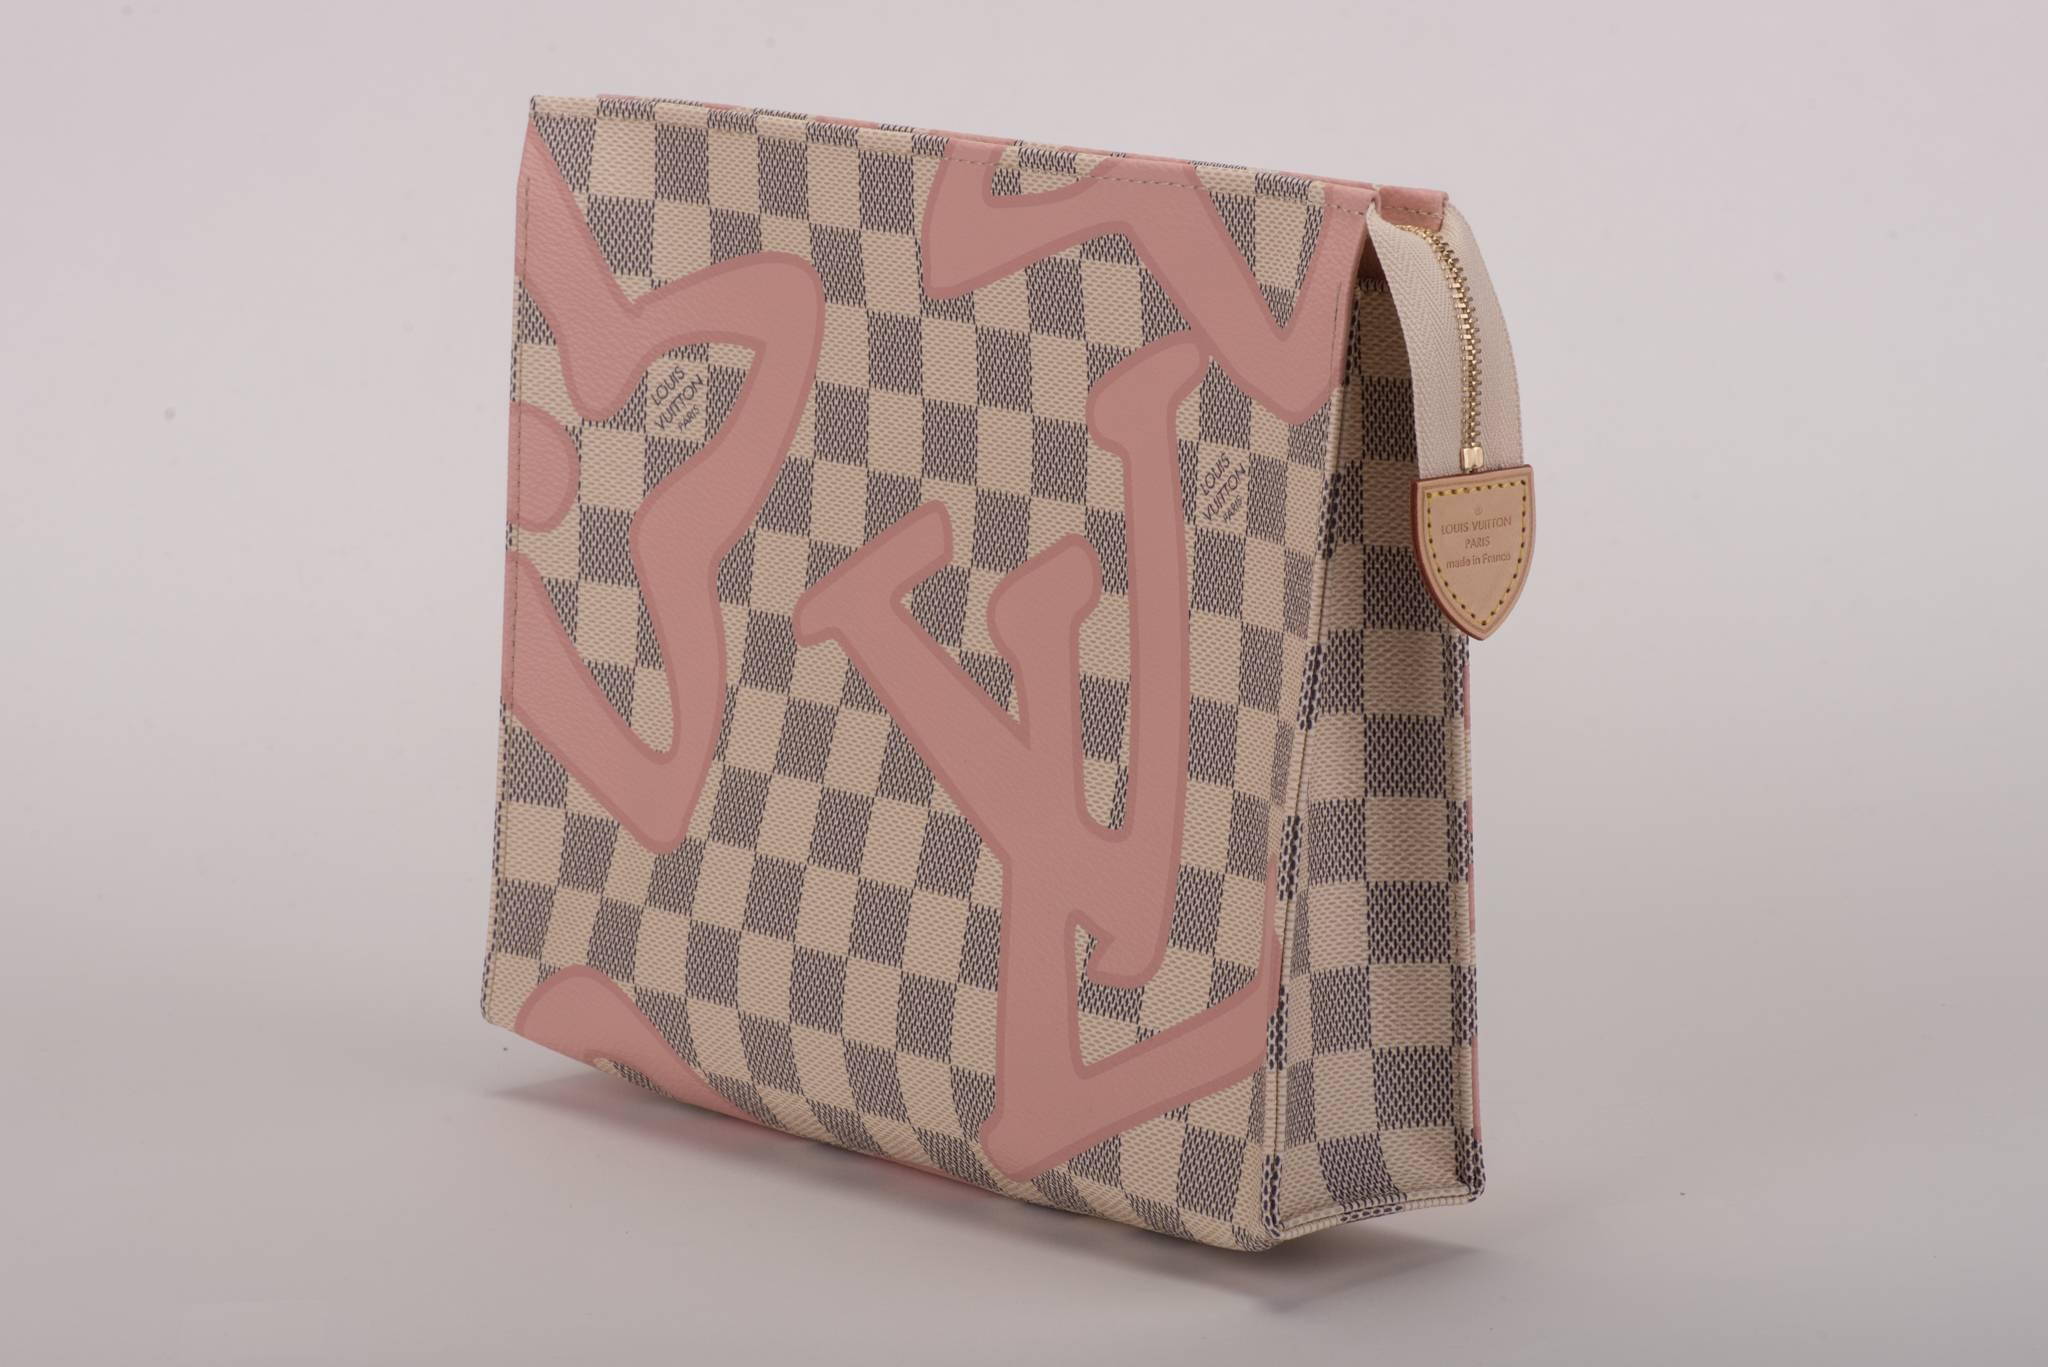 Louis Vuitton Limited Edition Tahiti Damier Pouchette lfOgPRwn2